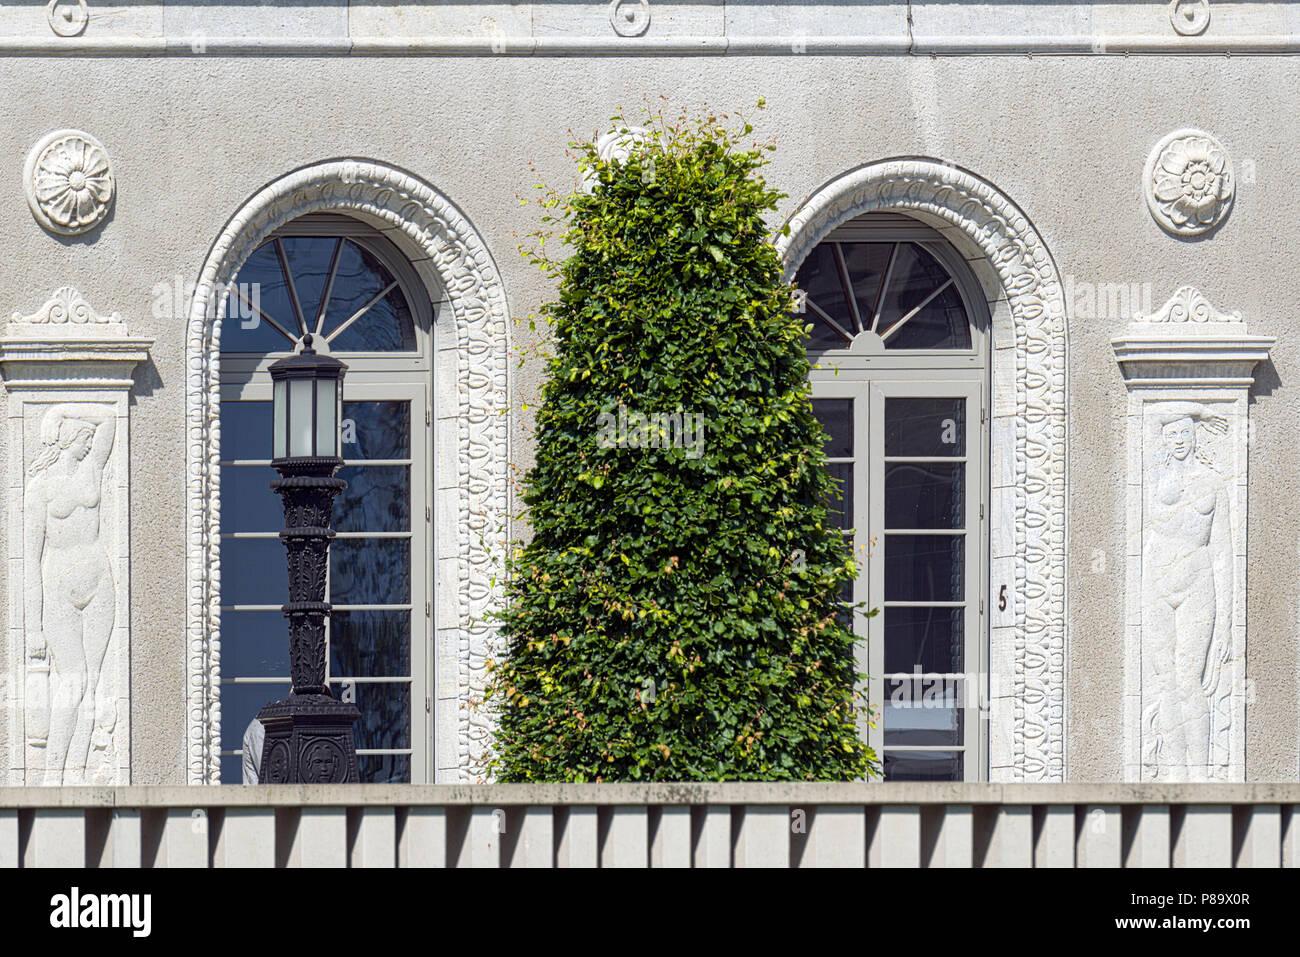 Geneva, Switzerland - june 10, 2018 : The headquarters of the World Trade Organization (WTO) is located in Centre William Rappard Stock Photo